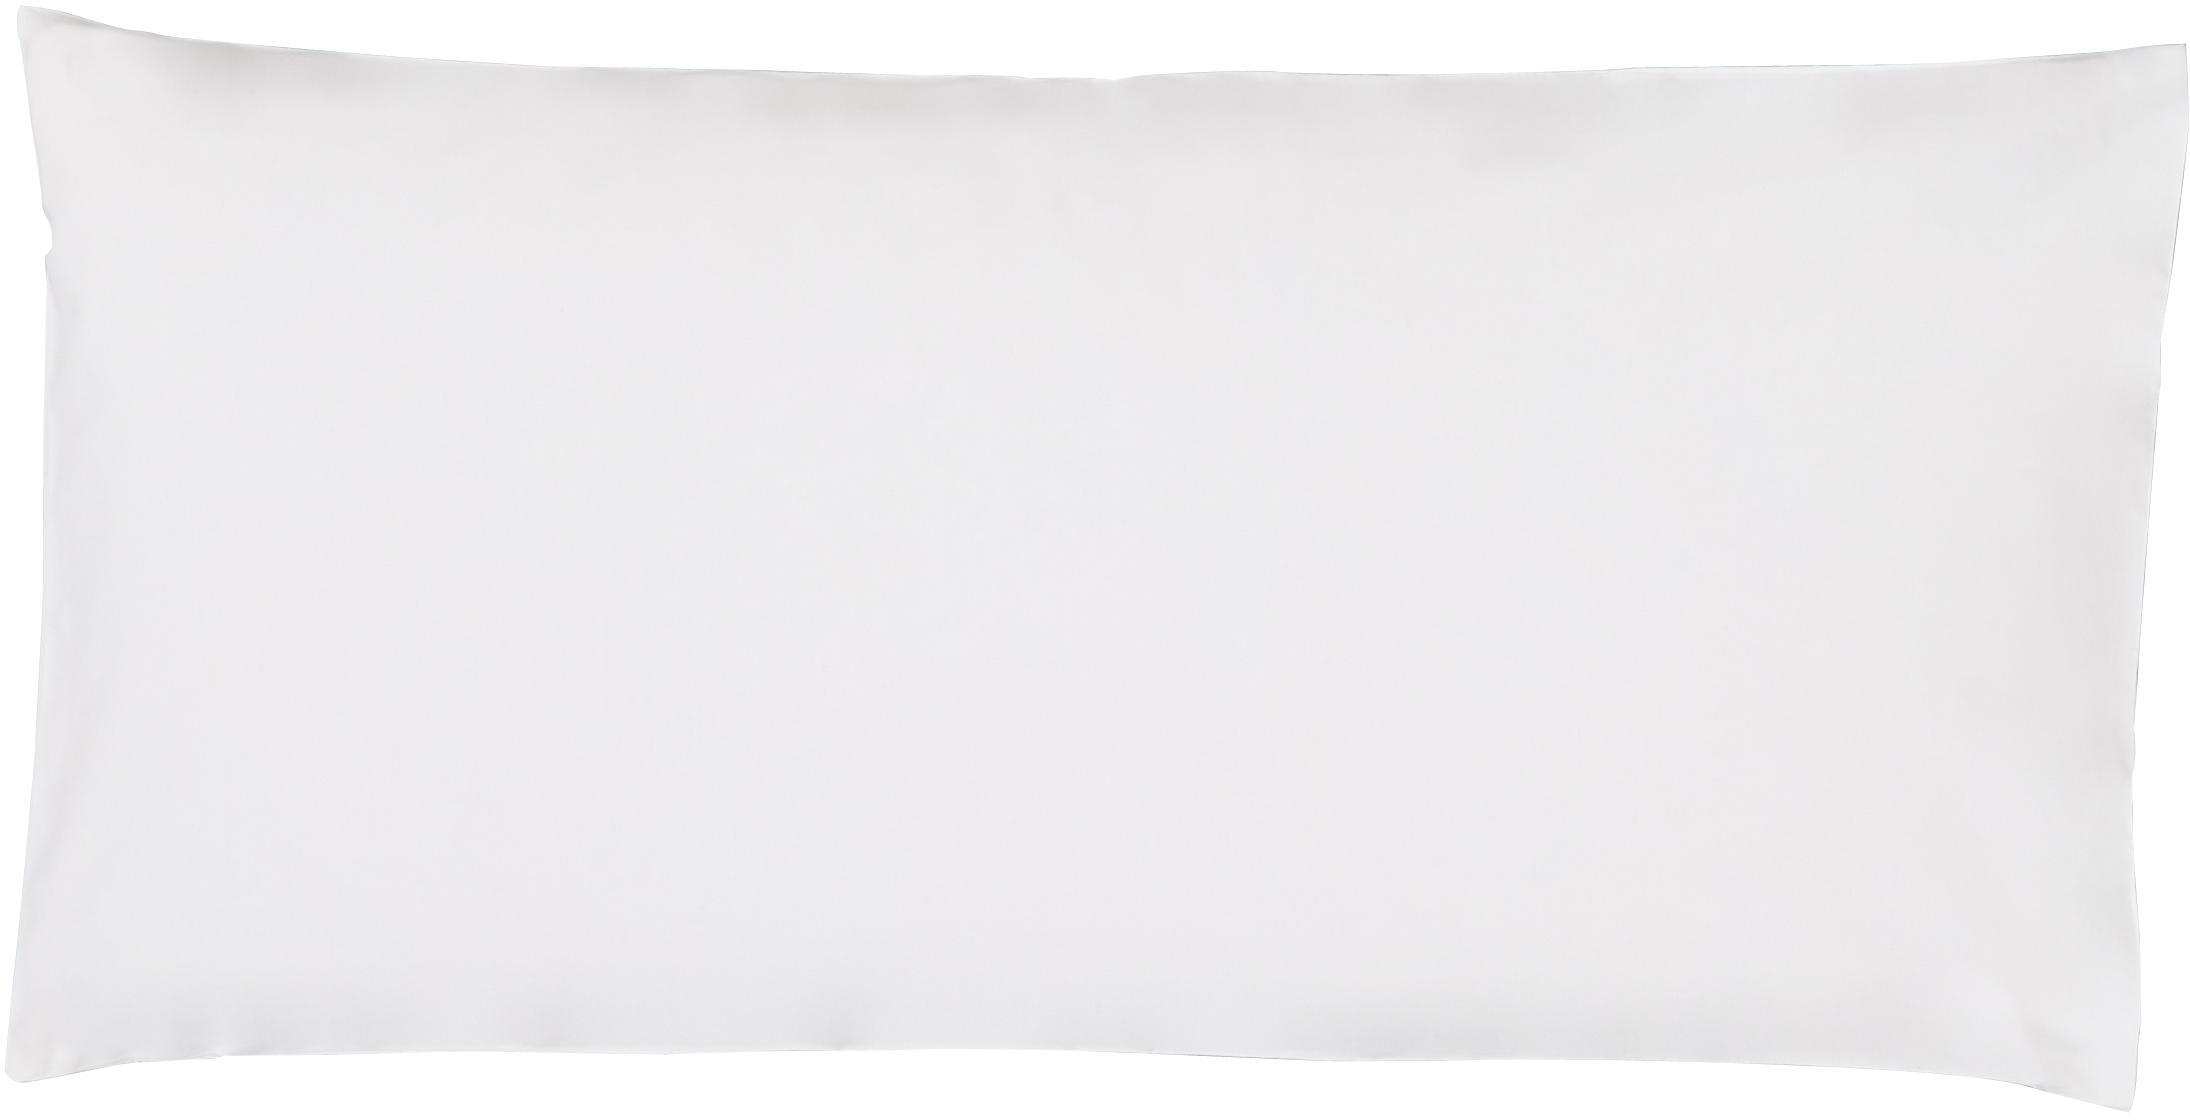 Baumwollperkal-Kissenbezüge Elsie in Weiß, 2 Stück, Webart: Perkal Fadendichte 200 TC, Weiß, 40 x 80 cm